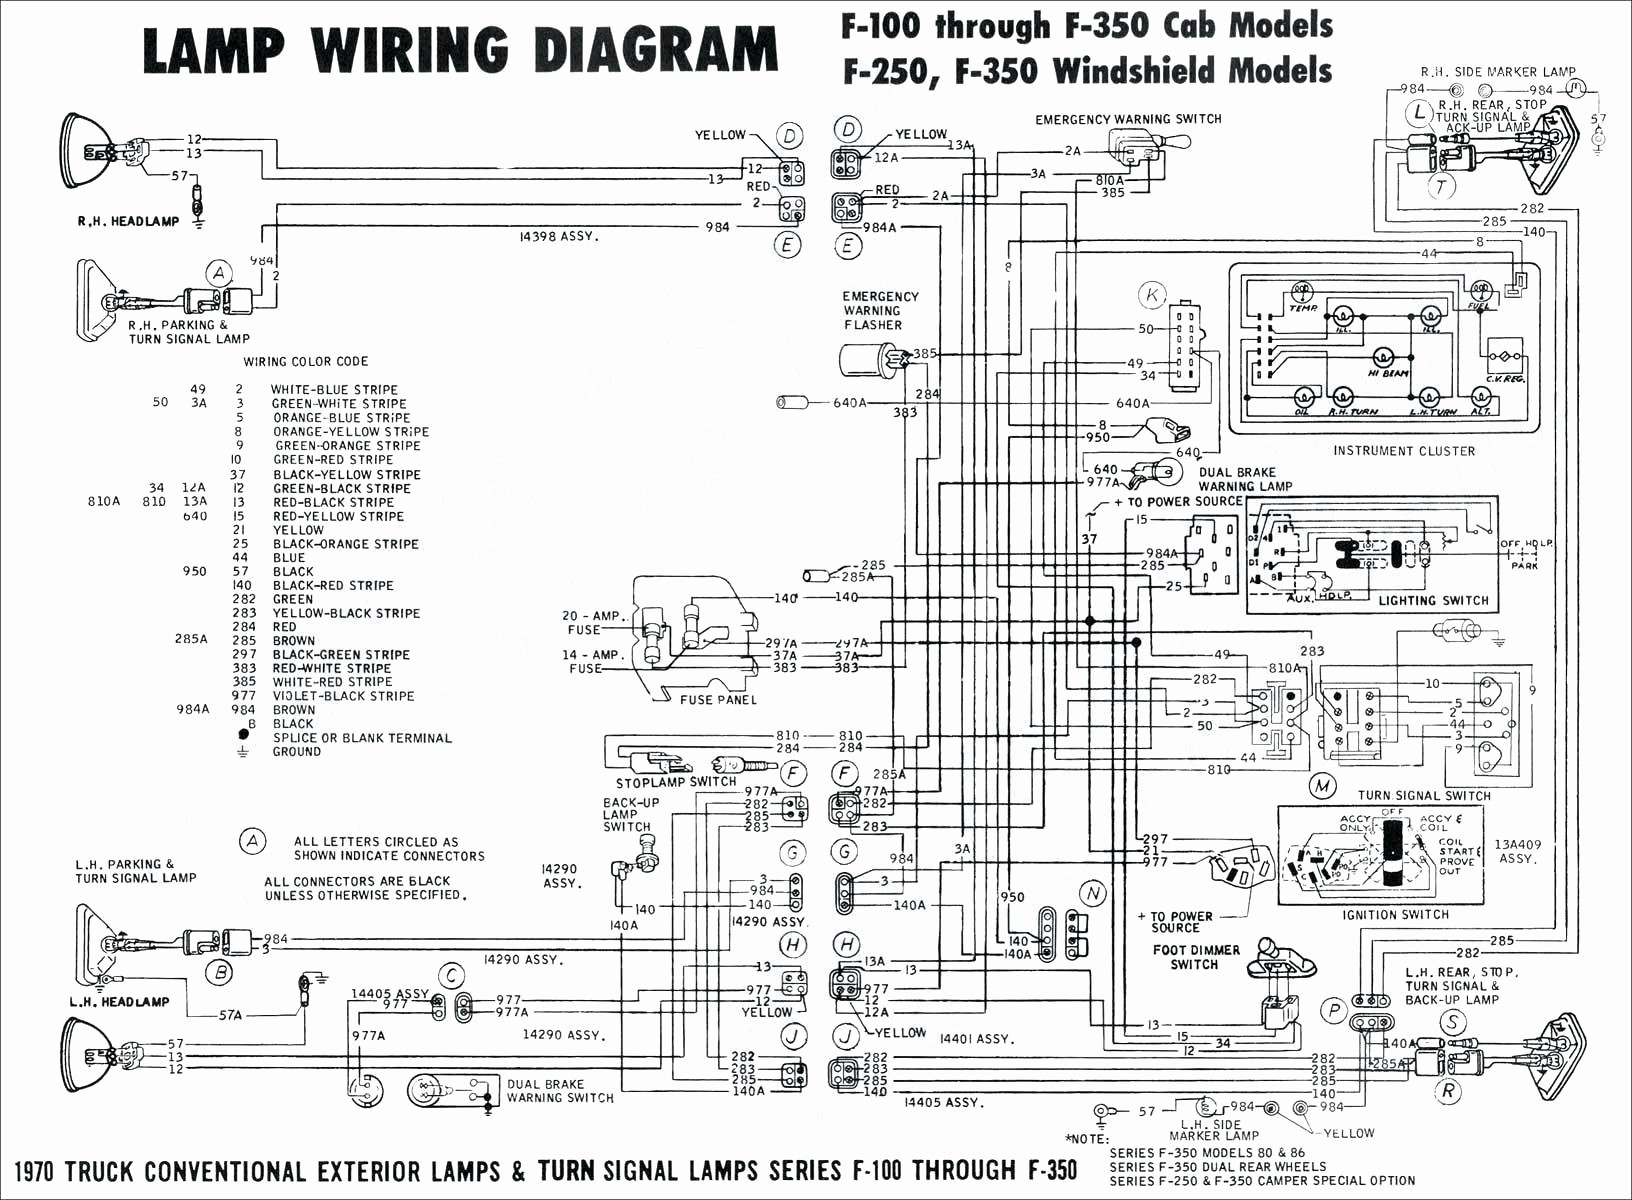 Ditch Witch 410sx Wiring Diagram Ditch Witch Parts Diagram Of Ditch Witch 410sx Wiring Diagram